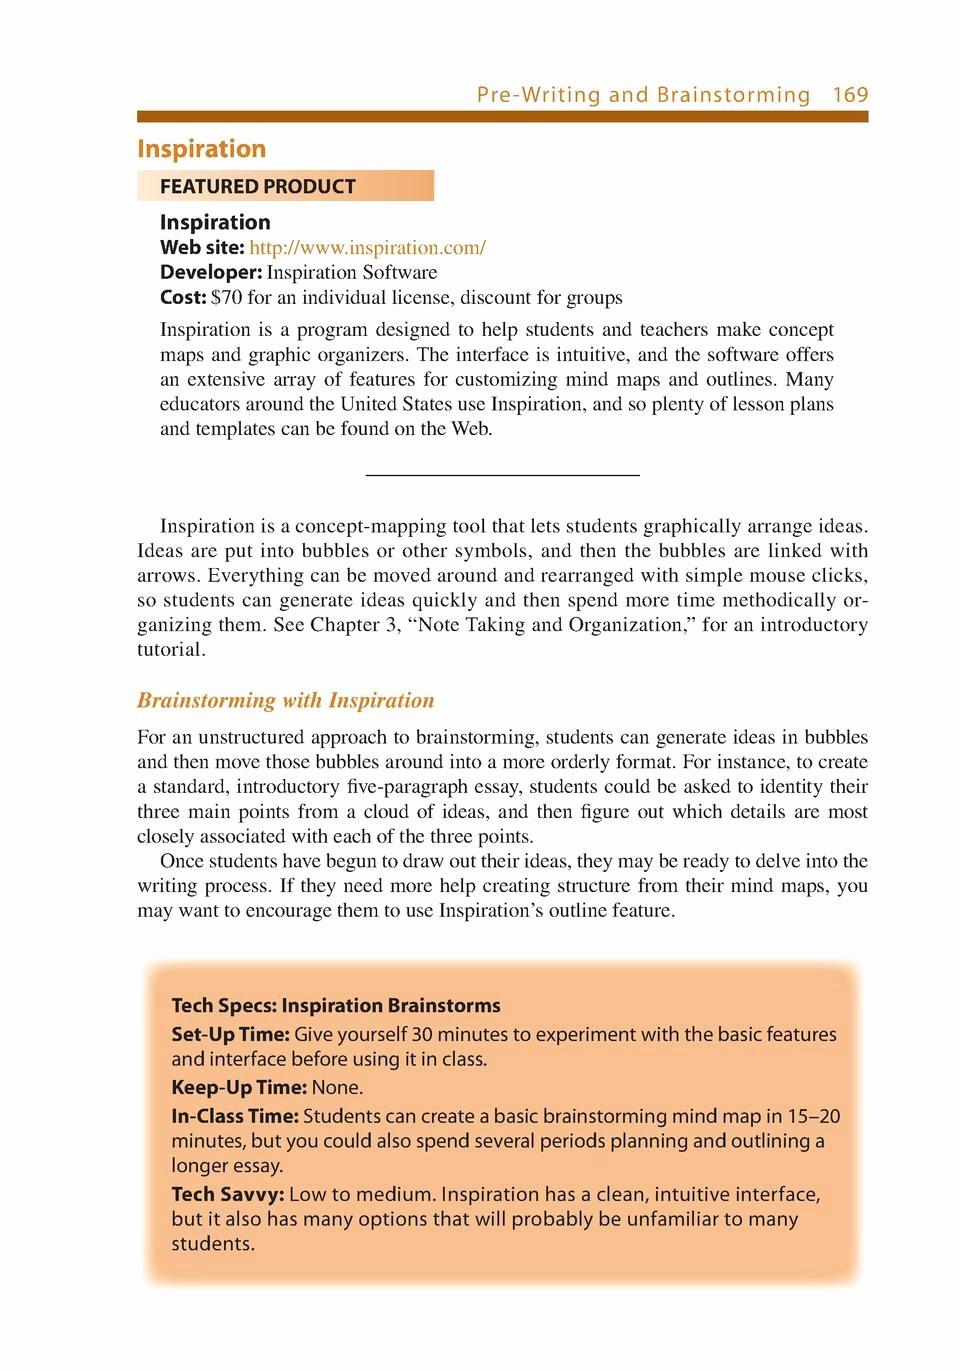 Mla format Open Office Template Elegant Openoffice Essay Outline Template Fresh Essays